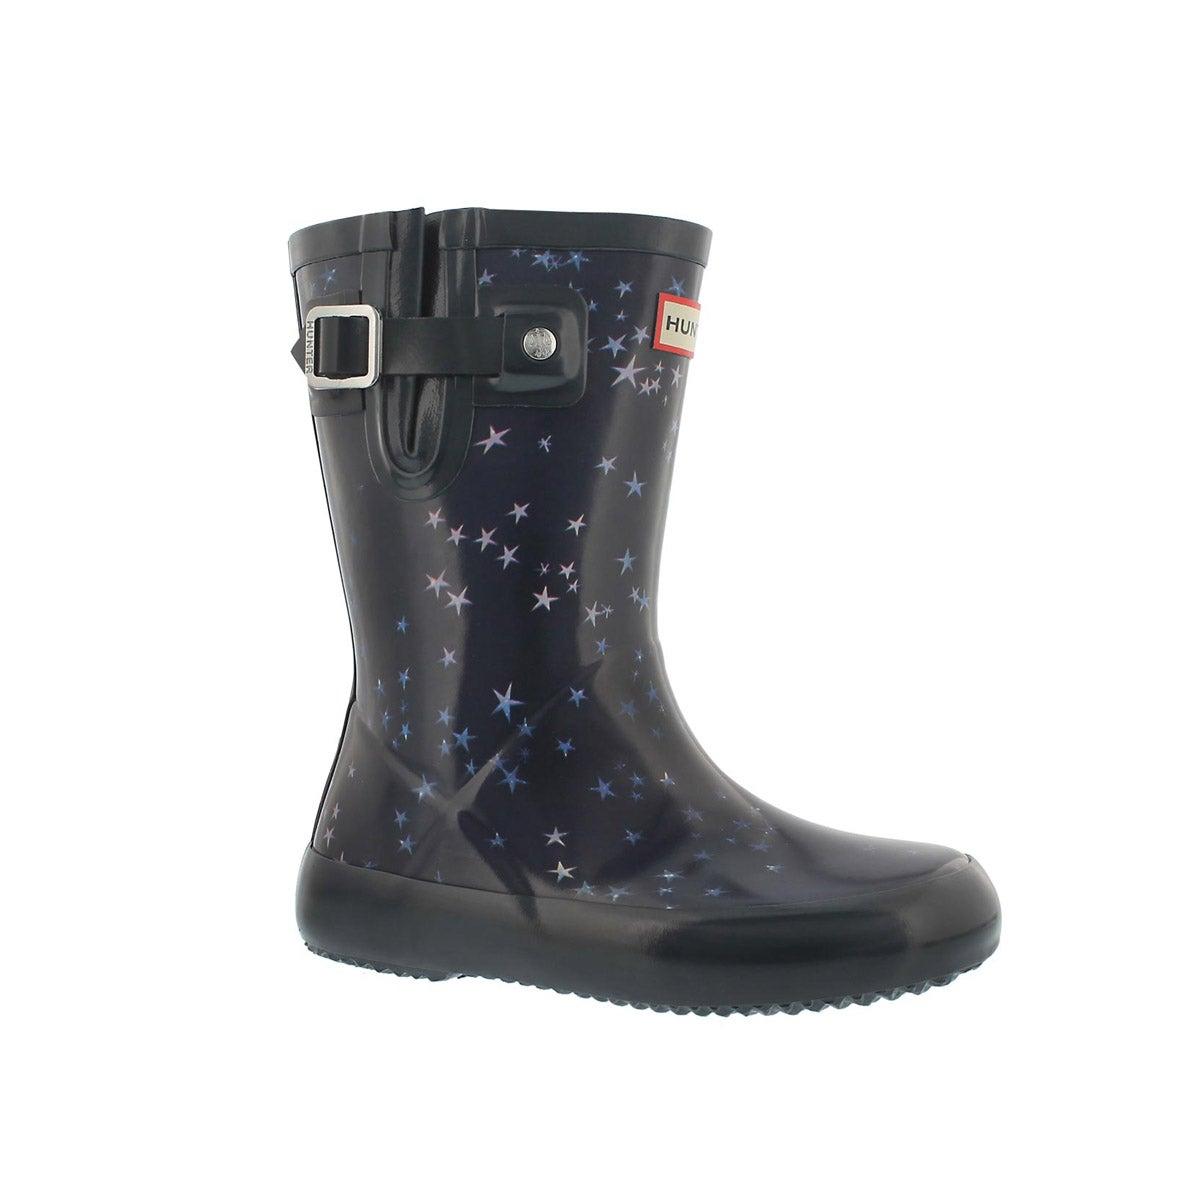 Infants' FIRST FLAT SOLE midnight rain boots